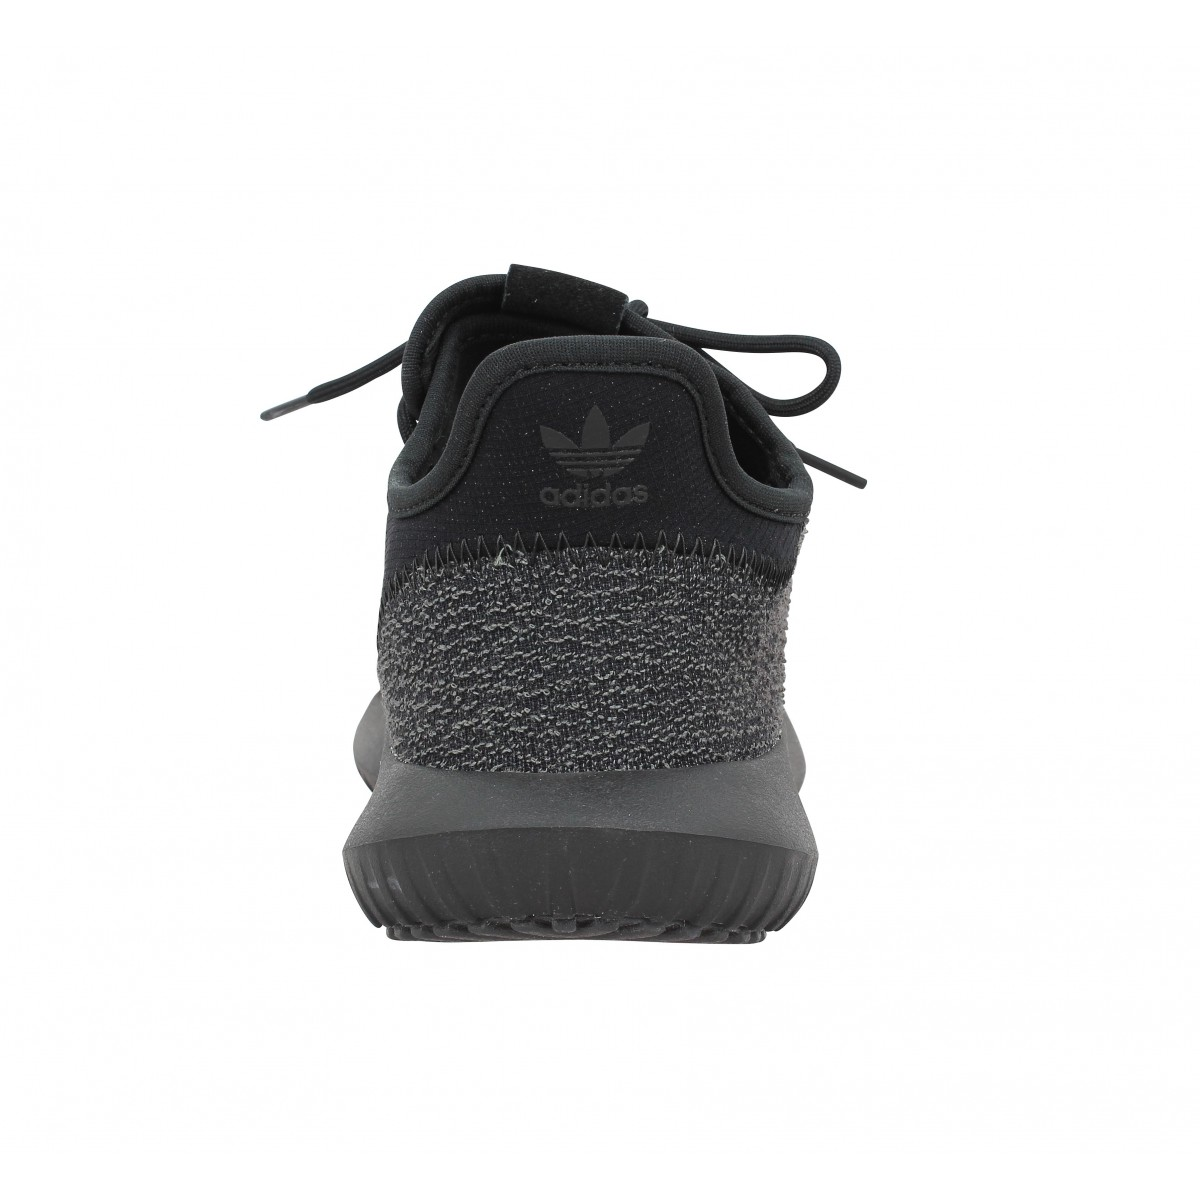 Chaussures Shadow Tubular Adidas Black Toile Fanny Homme 4hc7vxn7b 1Jlc3TFK